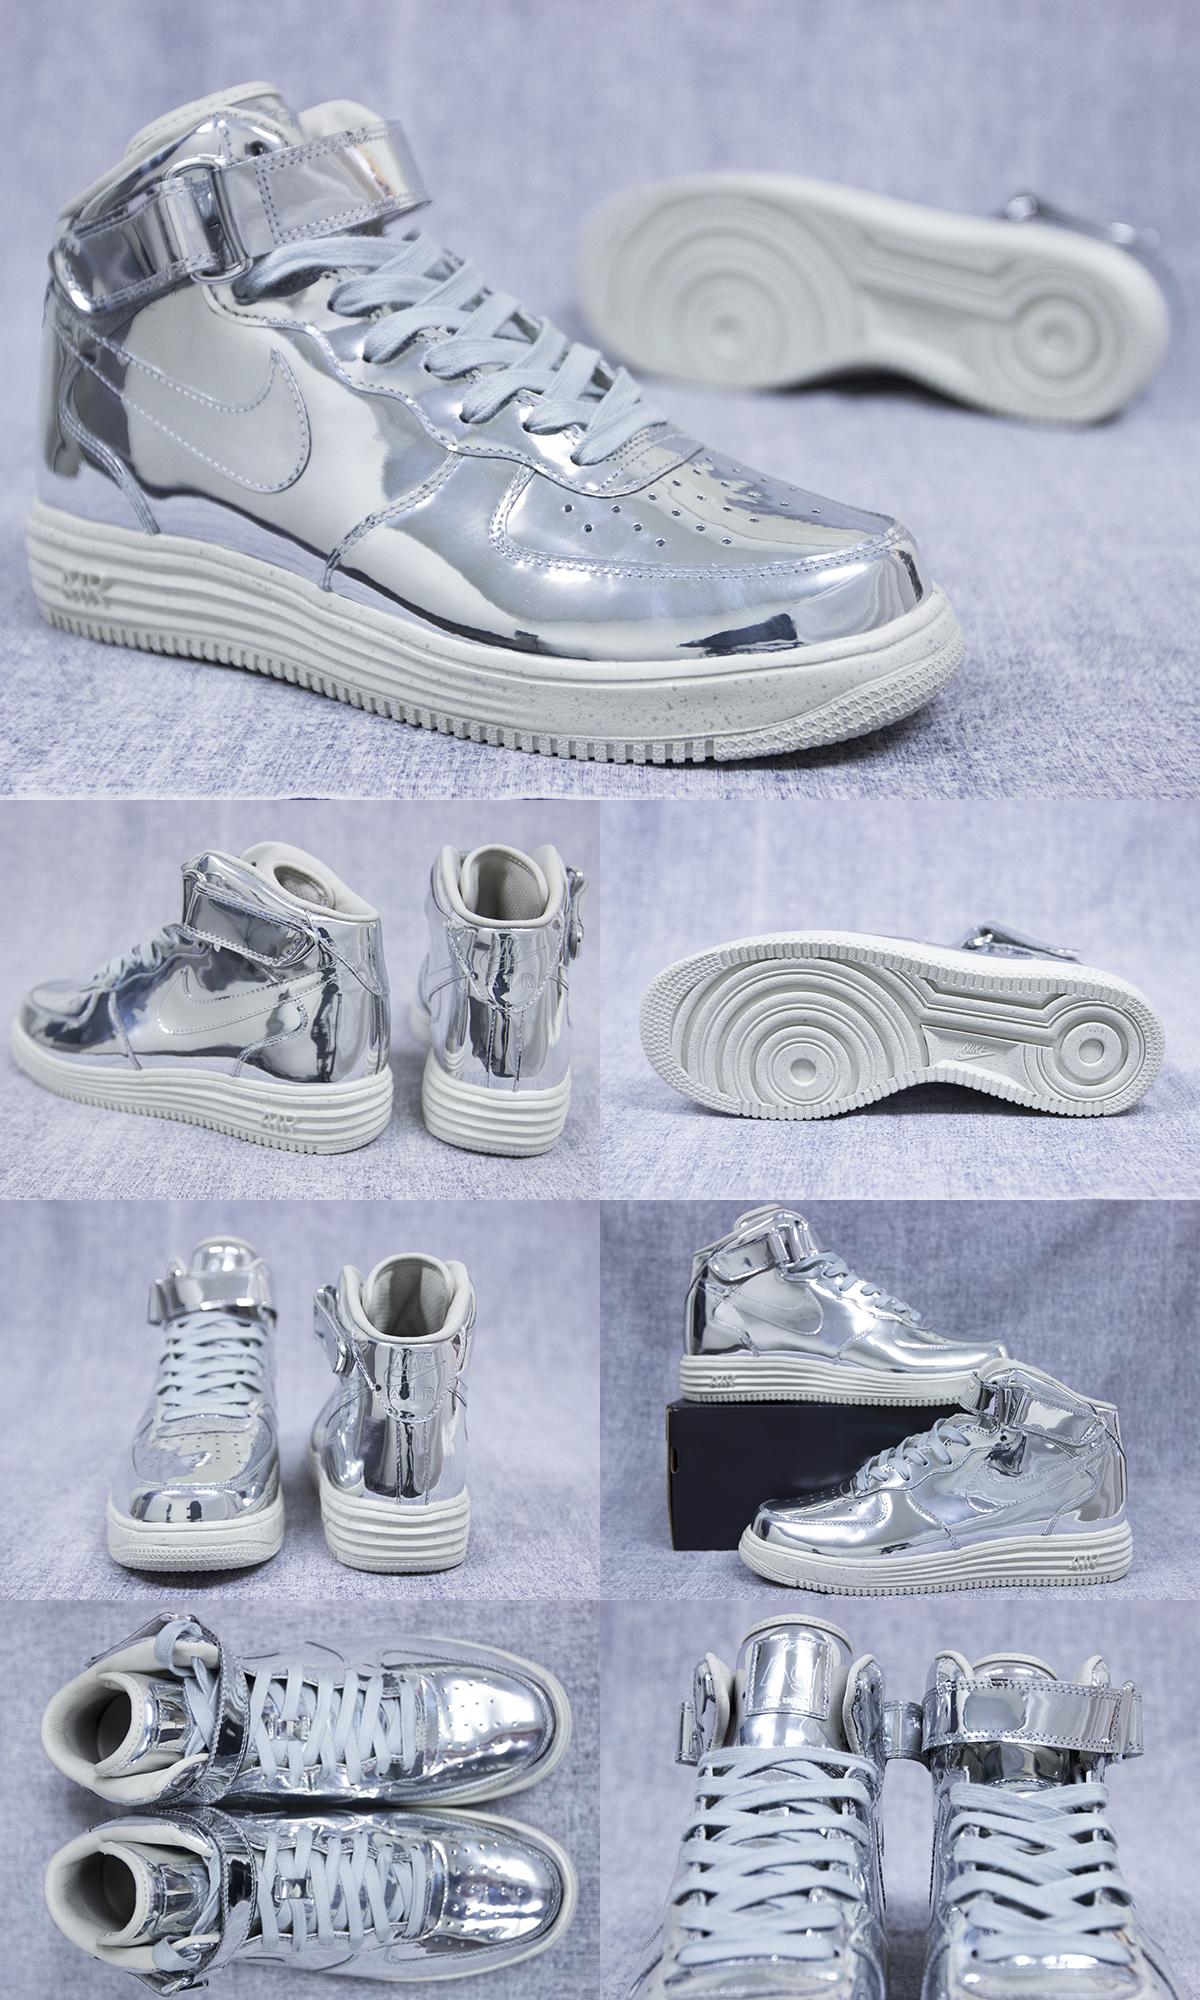 Nike Lunar Force 1 Mid SP 652849 092 Metallic Silver New DS Sz Sz 11 11 5 12 | eBay